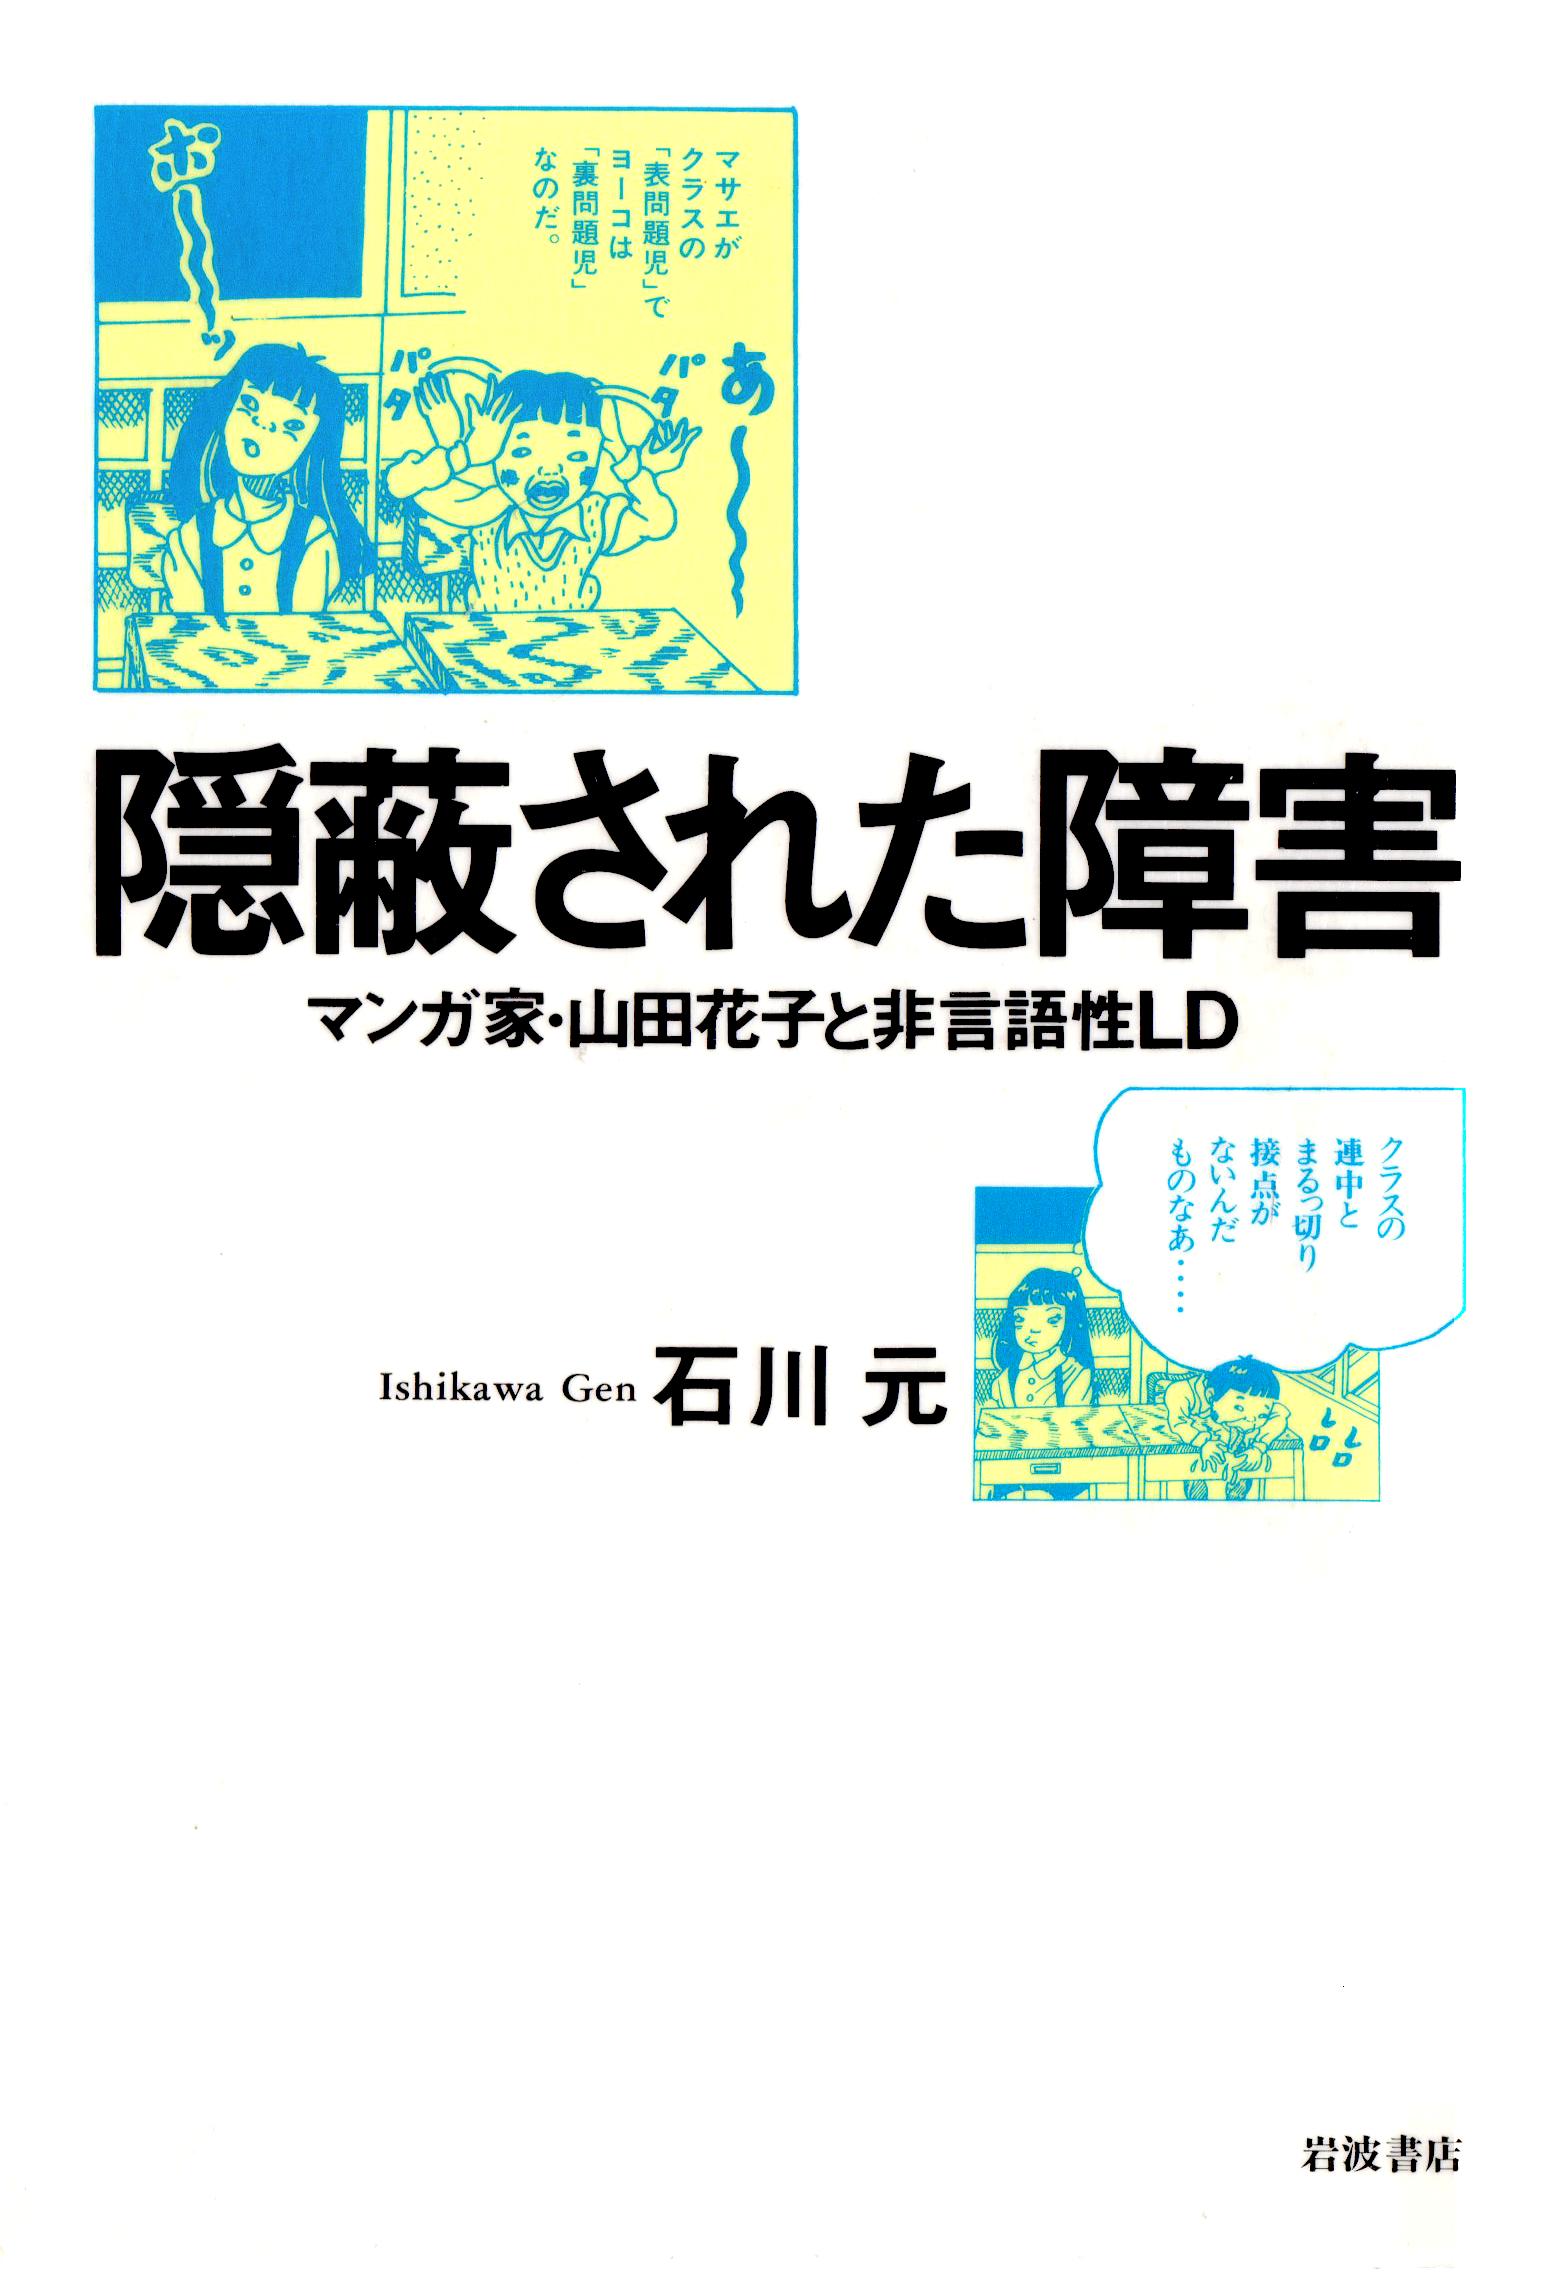 f:id:kougasetumei:20180916210142p:image:w295